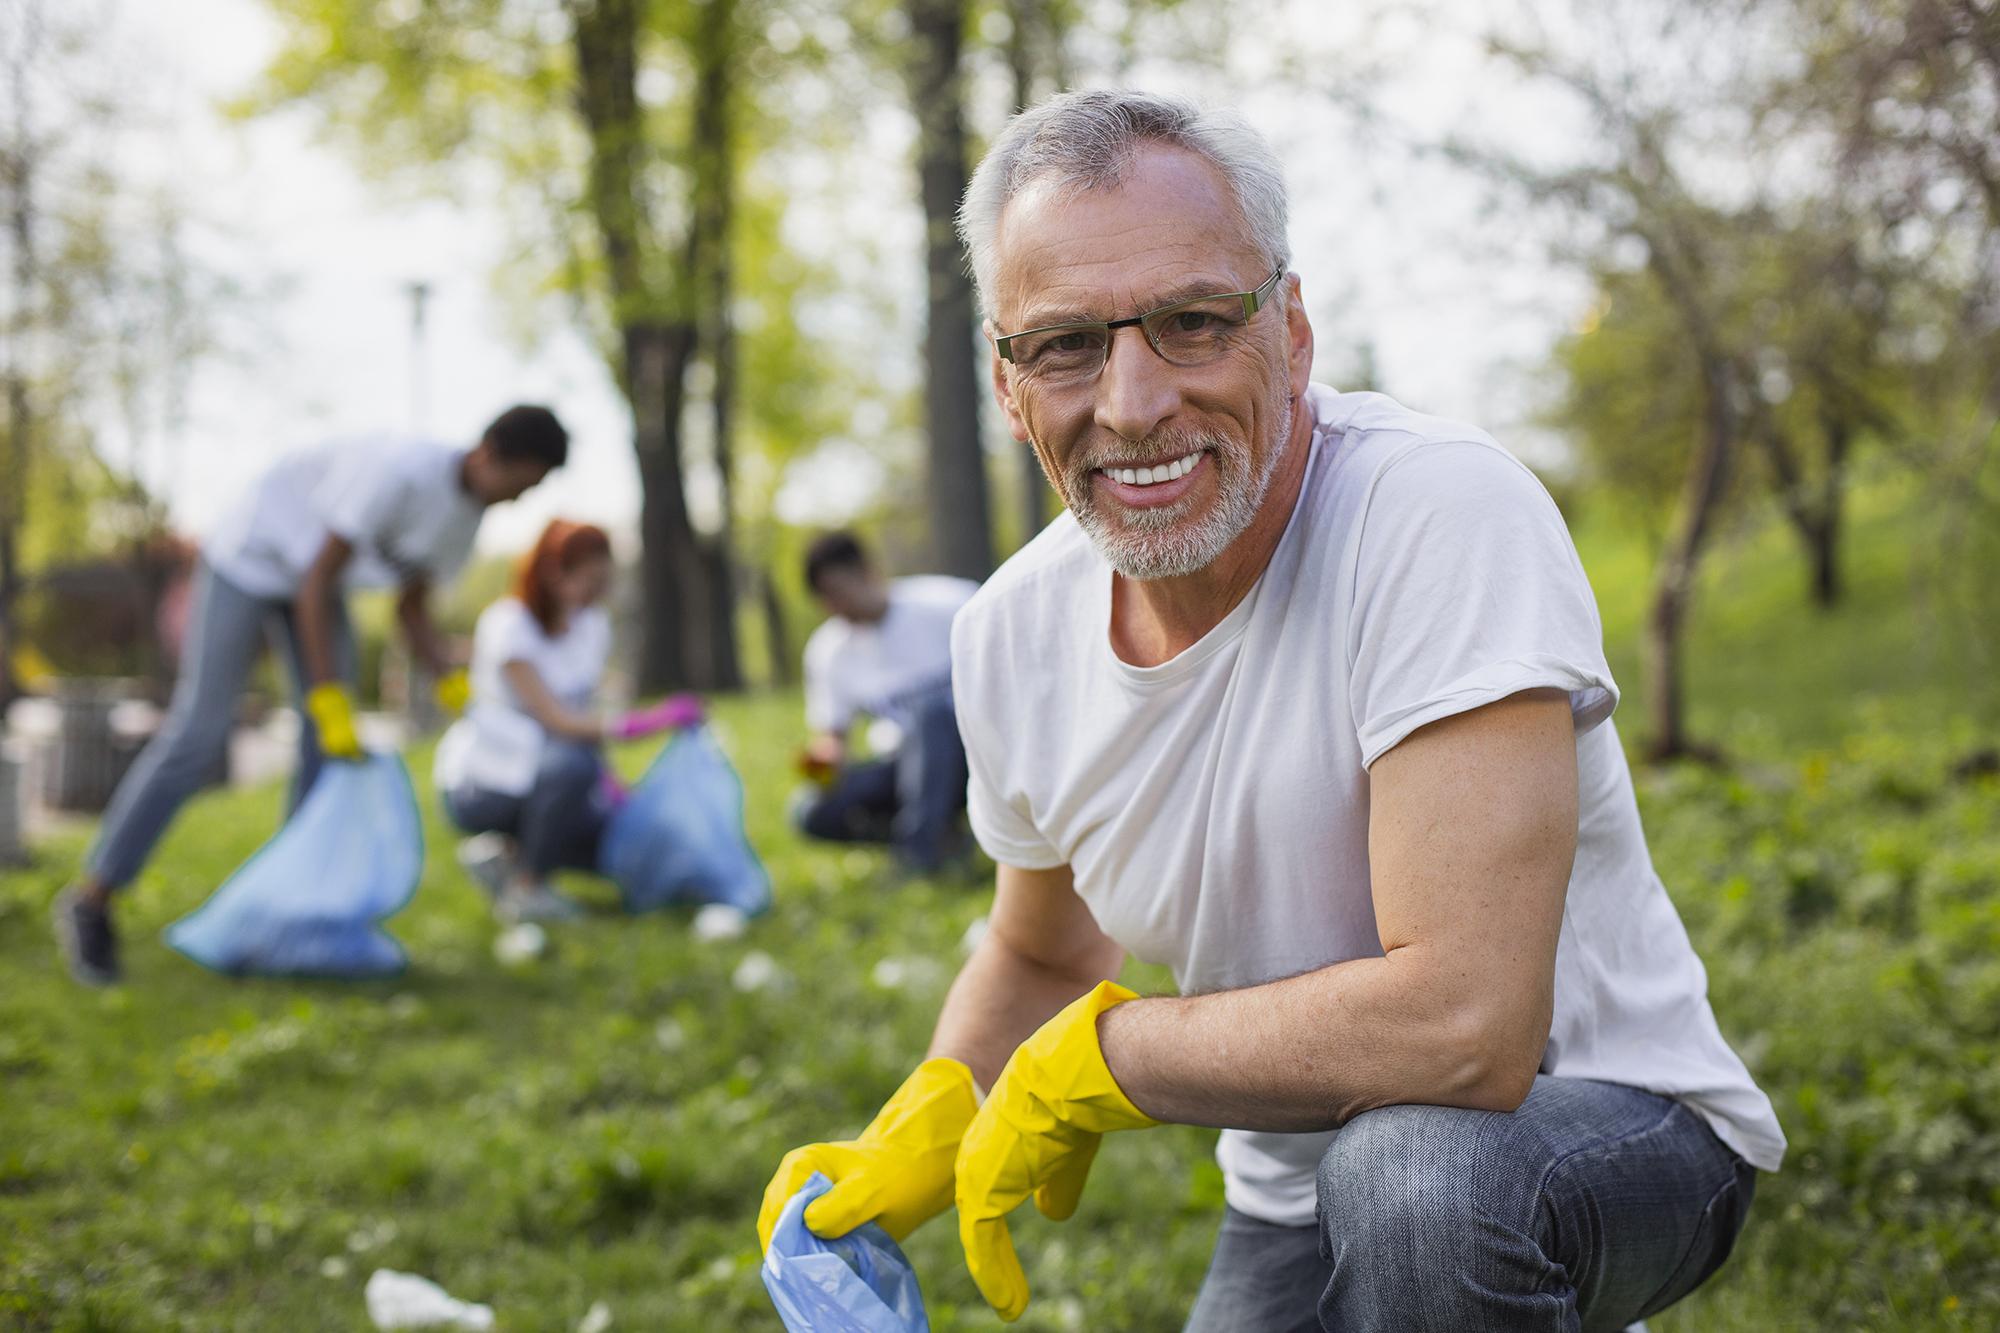 A retired volunteer. (Image: Shutterstock)